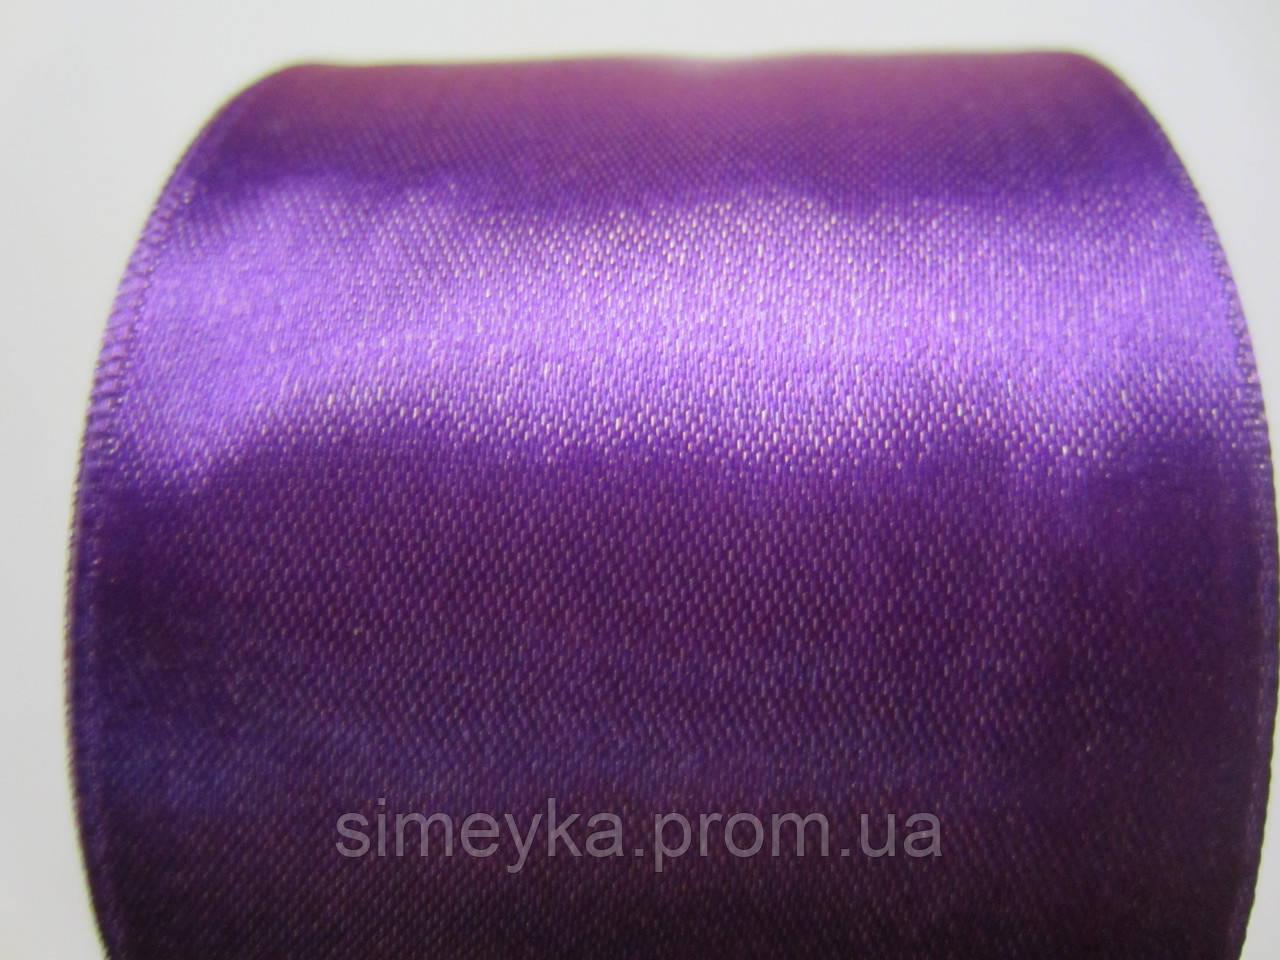 Кусок 0,65 м!!! Лента атлас 5 см Фиолетовая 0,65 м. Ост. 1 шт.